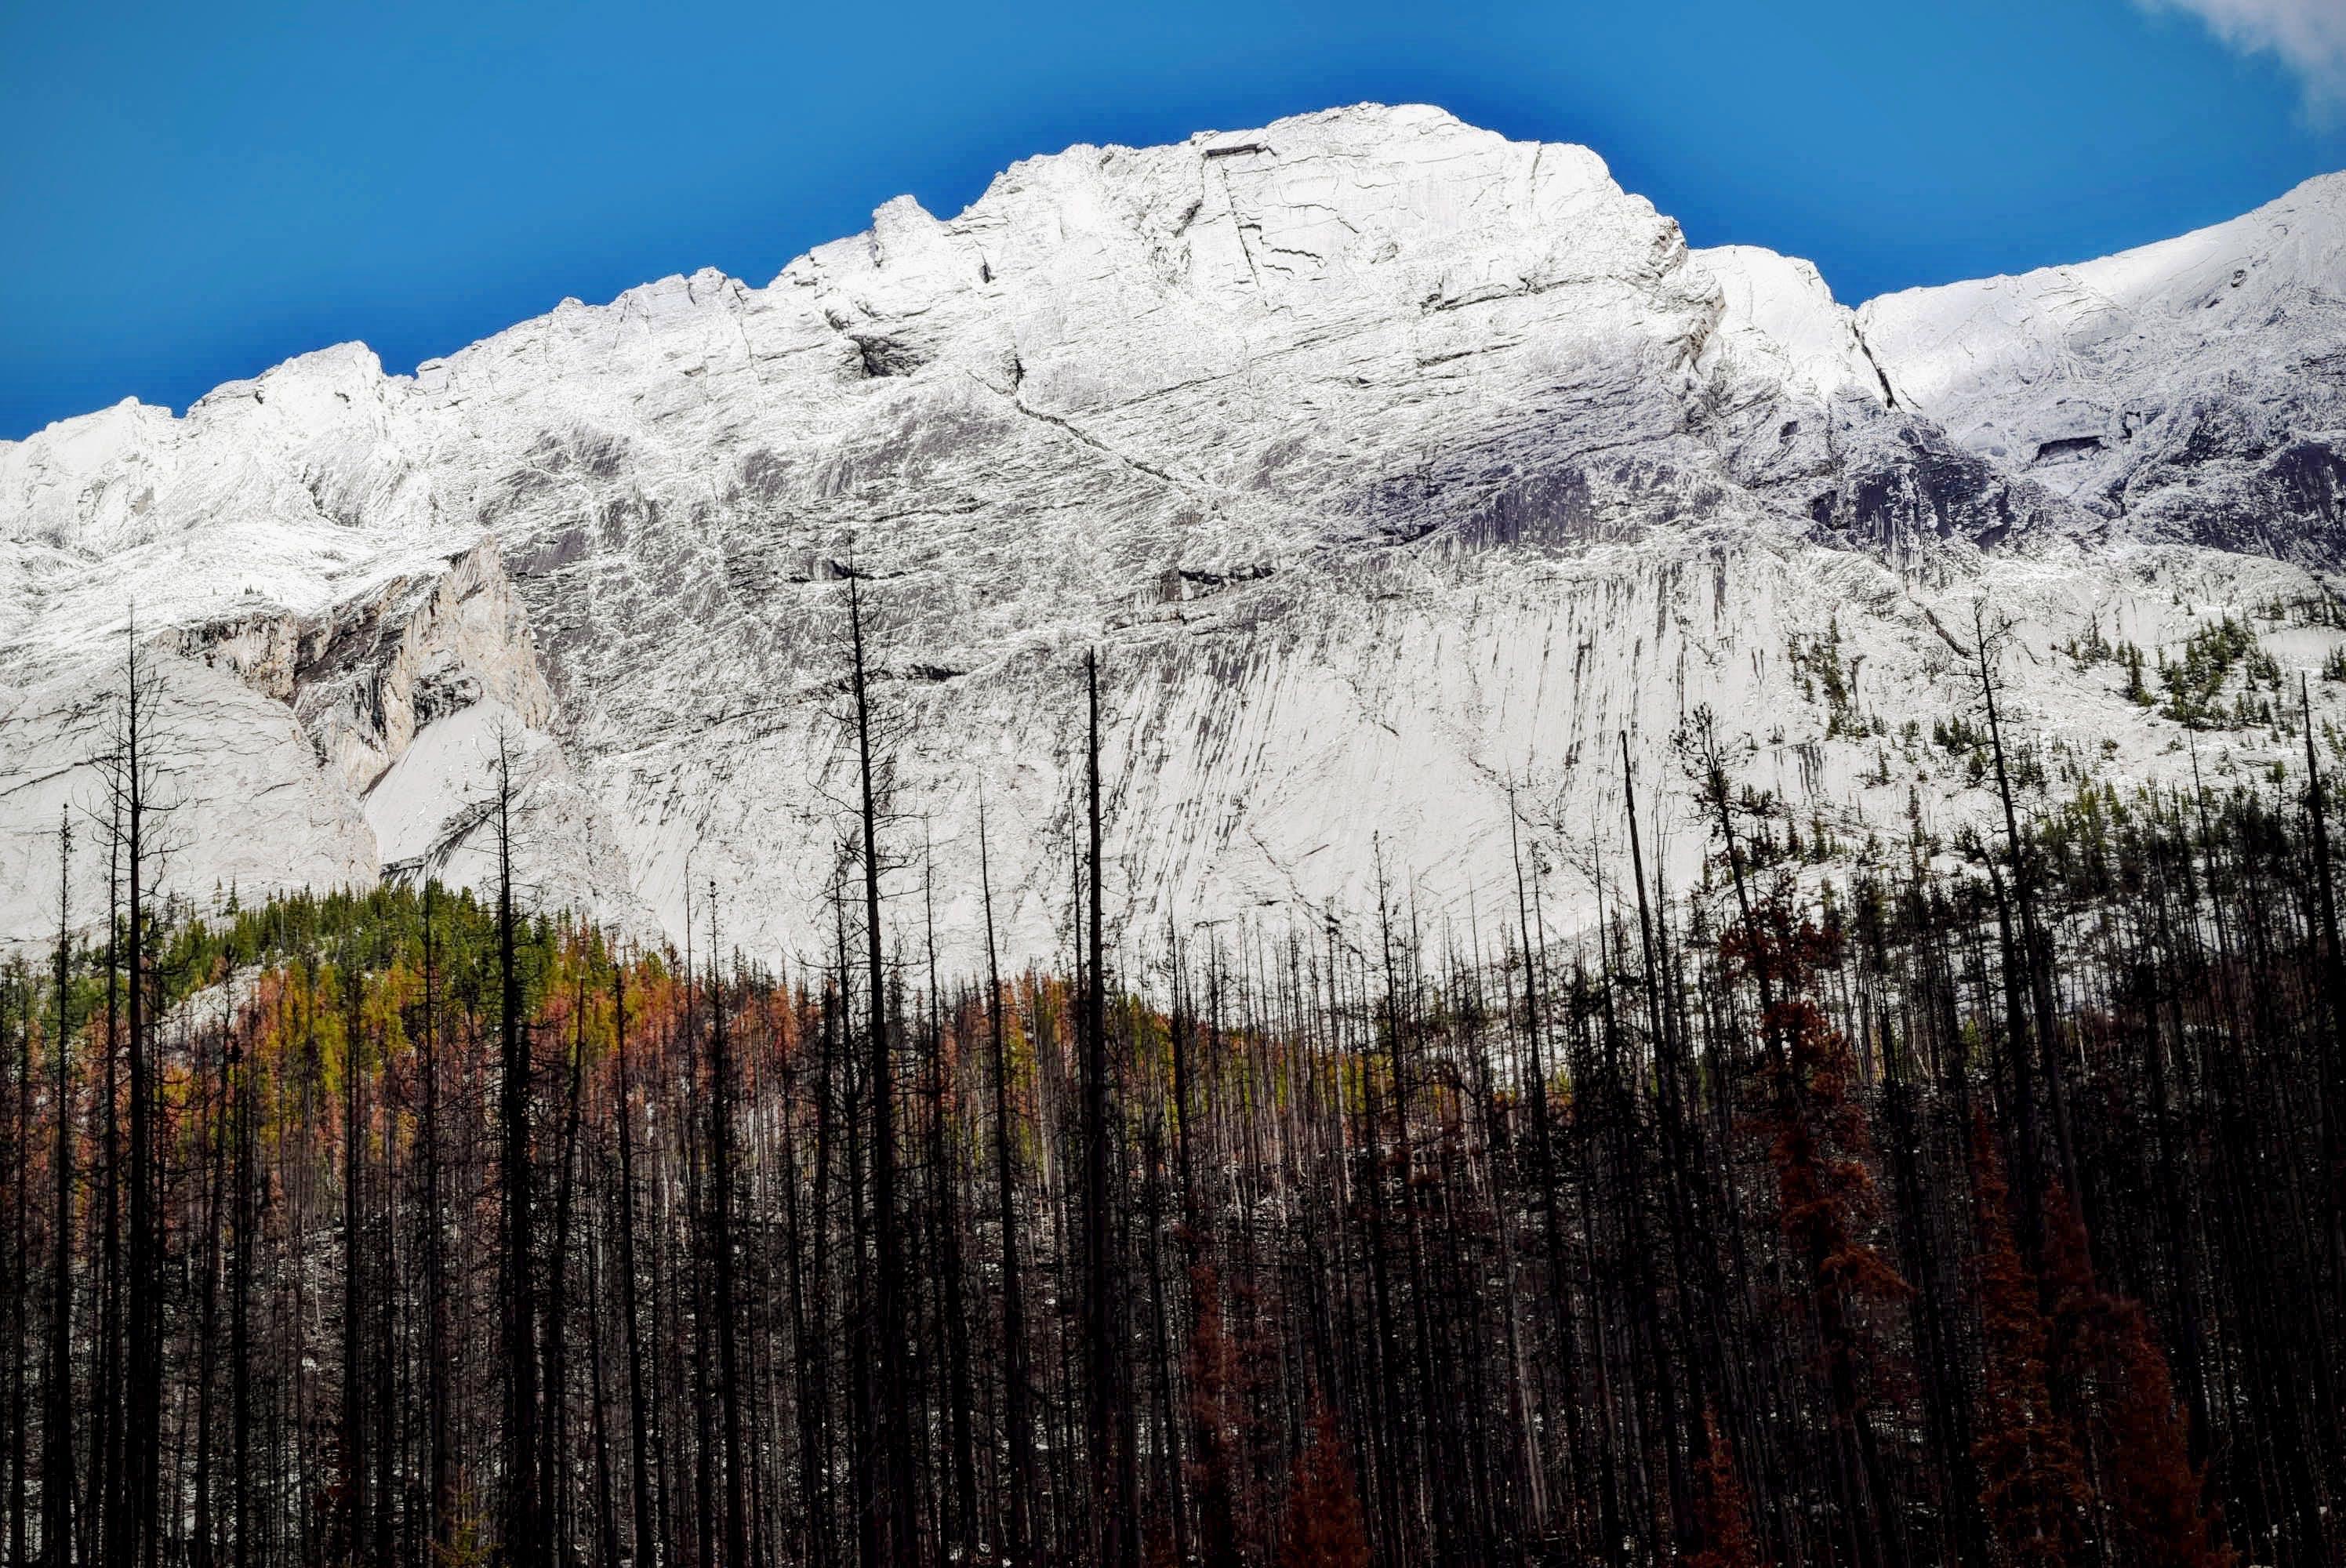 Kostenloses Stock Foto zu wald, bäume, berg, felswand